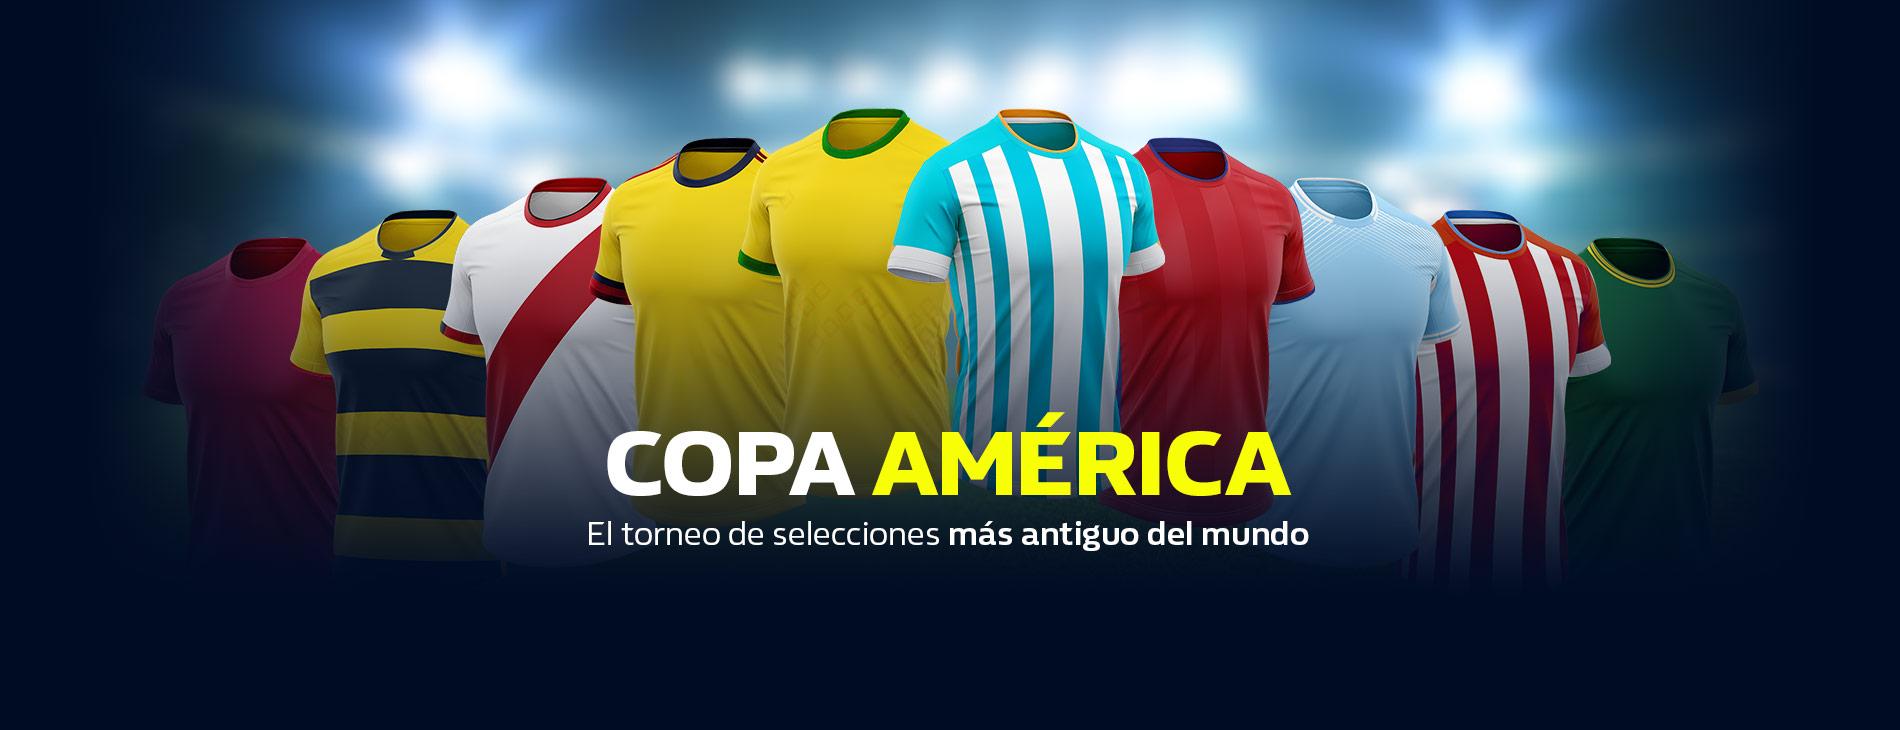 home_copa_america_full